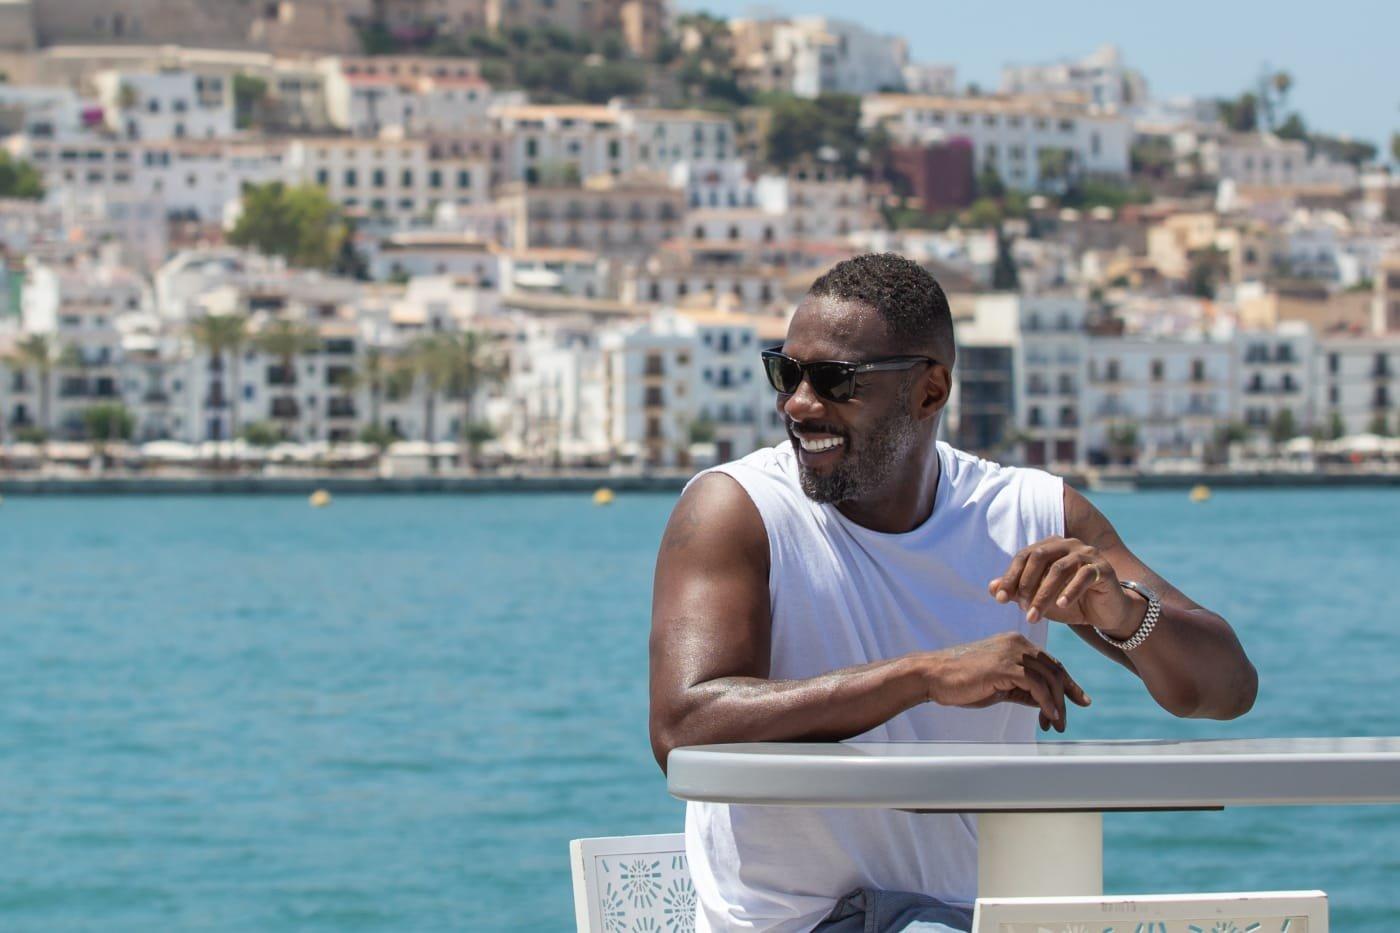 Idris Elba sunglasses